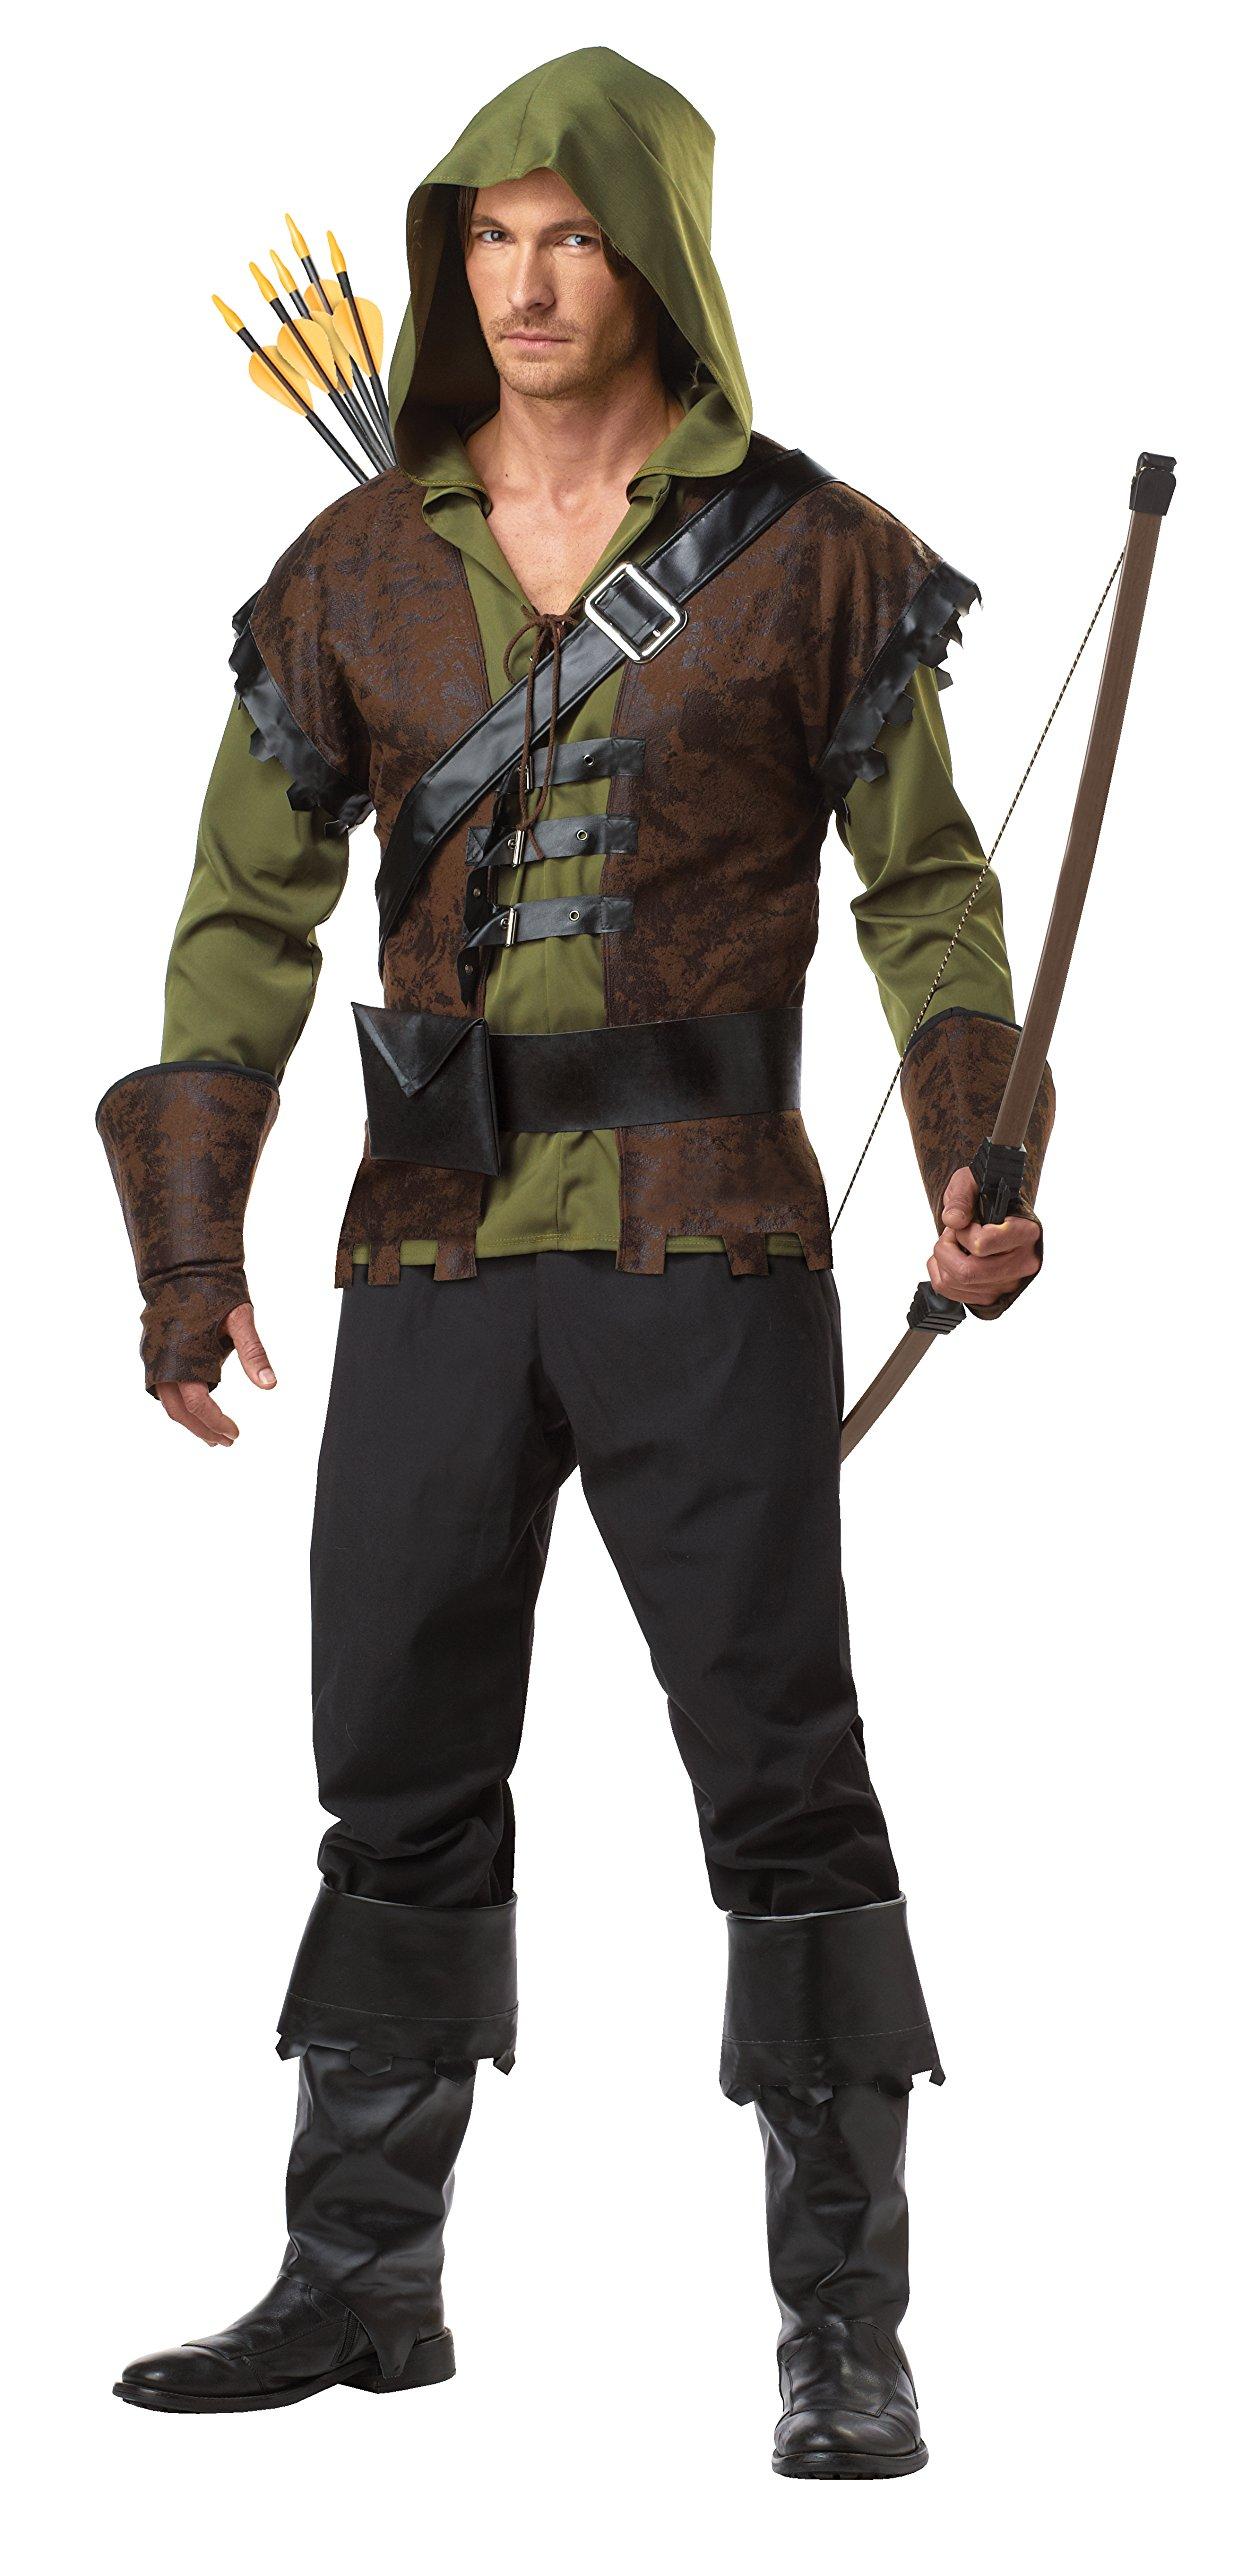 California Costumes Robin Hood Adult Costume, Olive/Brown, Medium by California Costumes